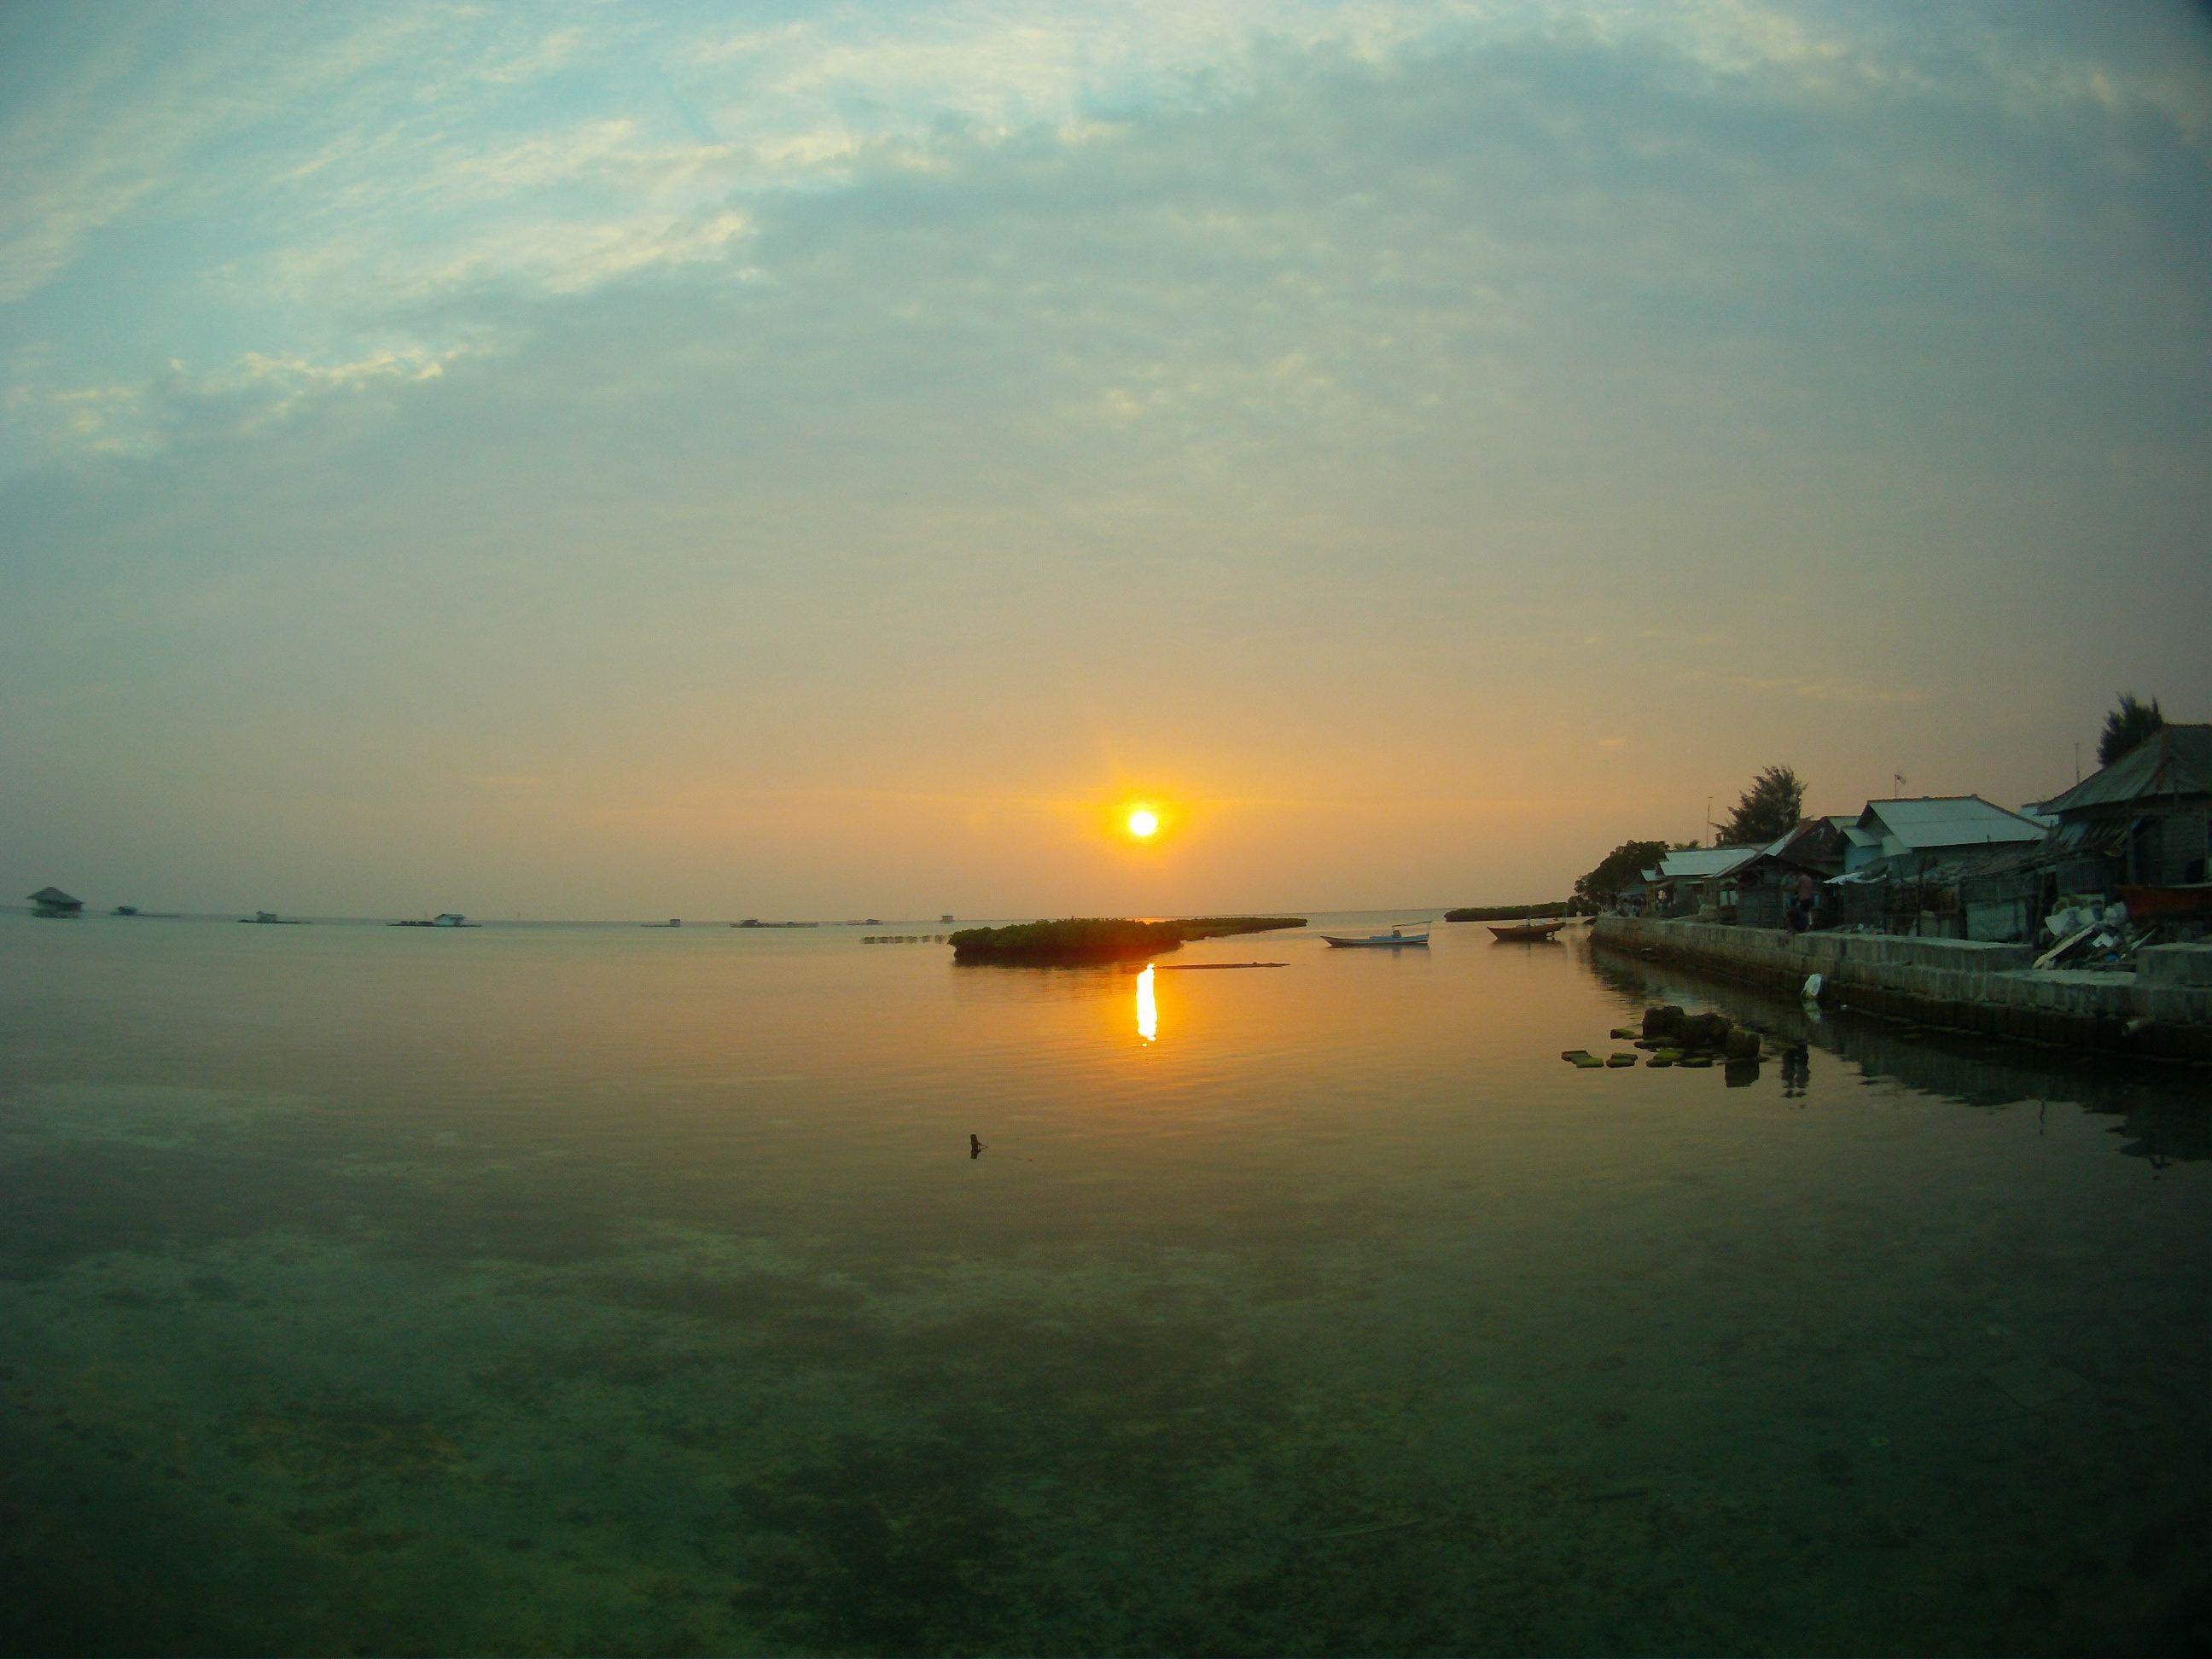 Sunrise on the Hope Island - Pulau Harapan - Indonesia